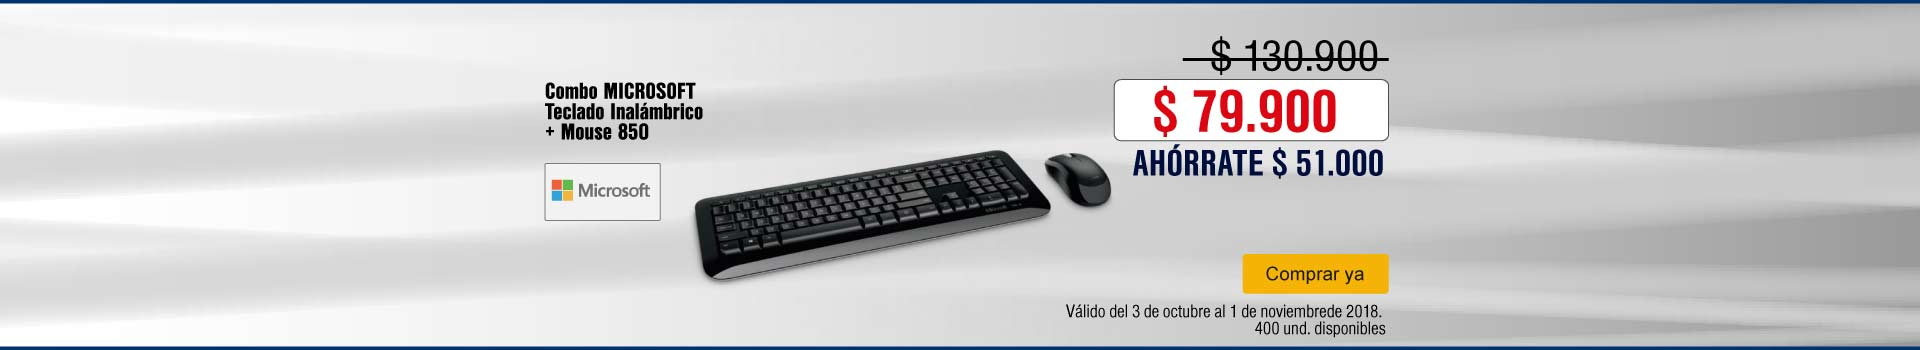 AK-KT-BCAT-19-accesorios-PP---teclado-microsoft-oct4